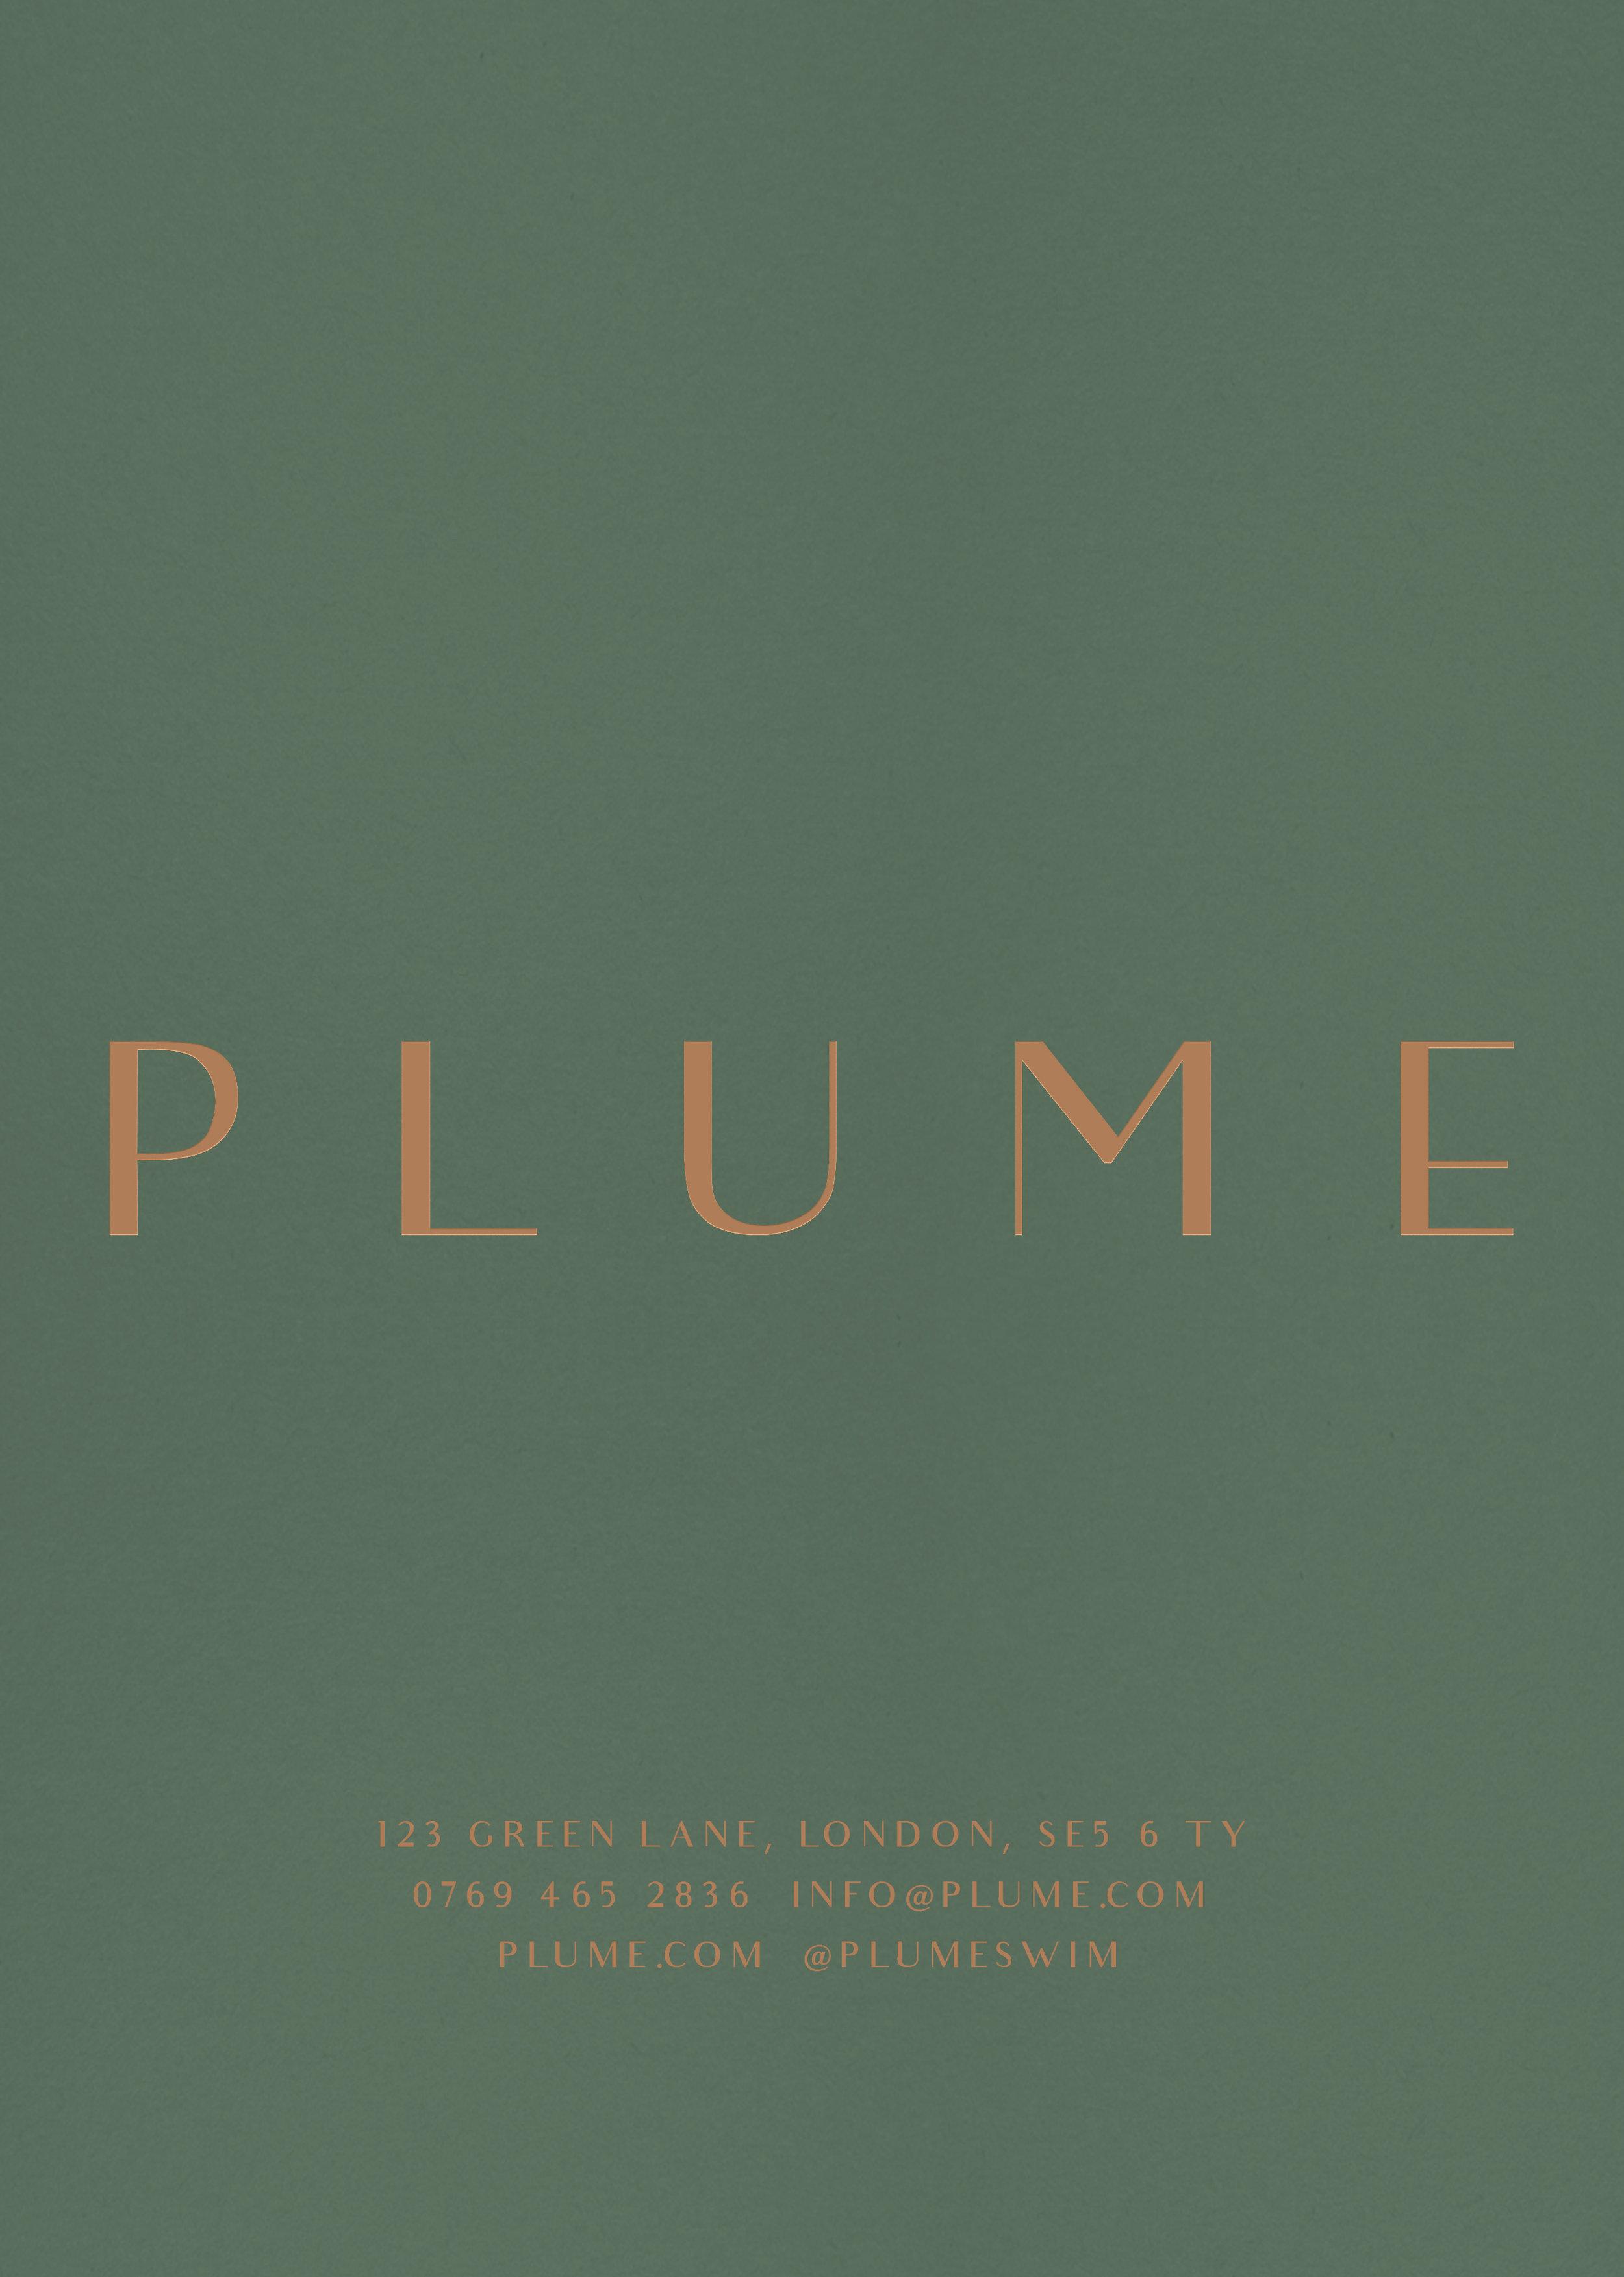 plume-fashion-logo-design-gold-loolaadesigns.jpg